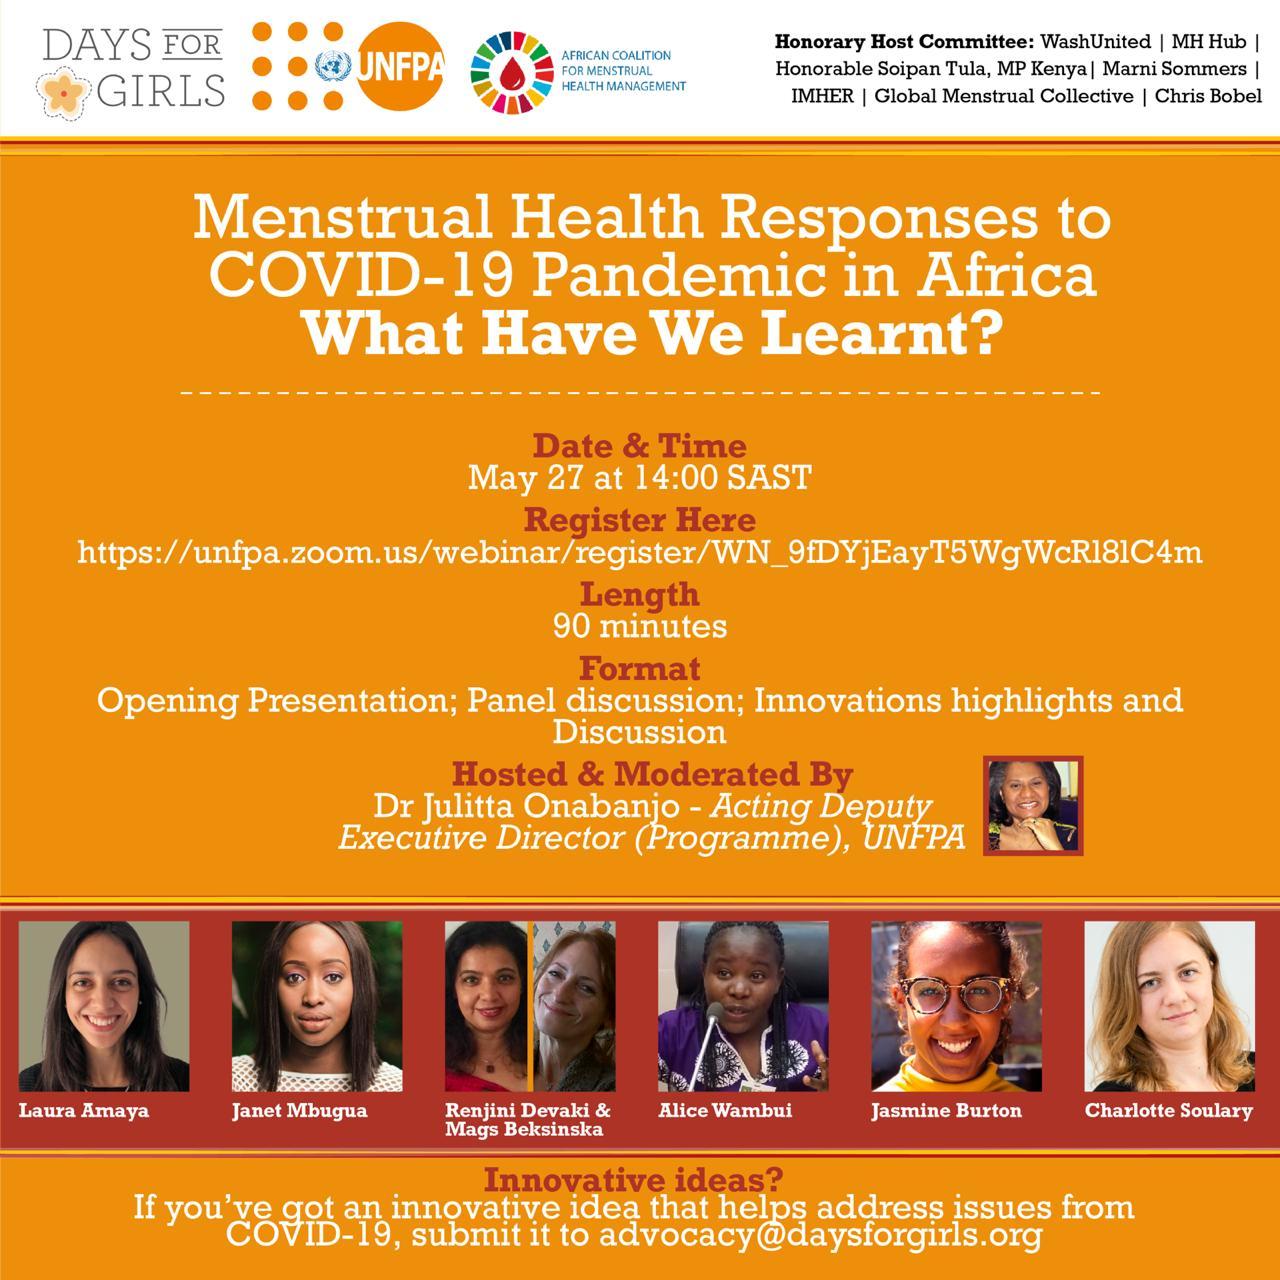 https://officialjanetmbugua.com/wp-content/uploads/2020/05/menstrual-health-conference.jpeg